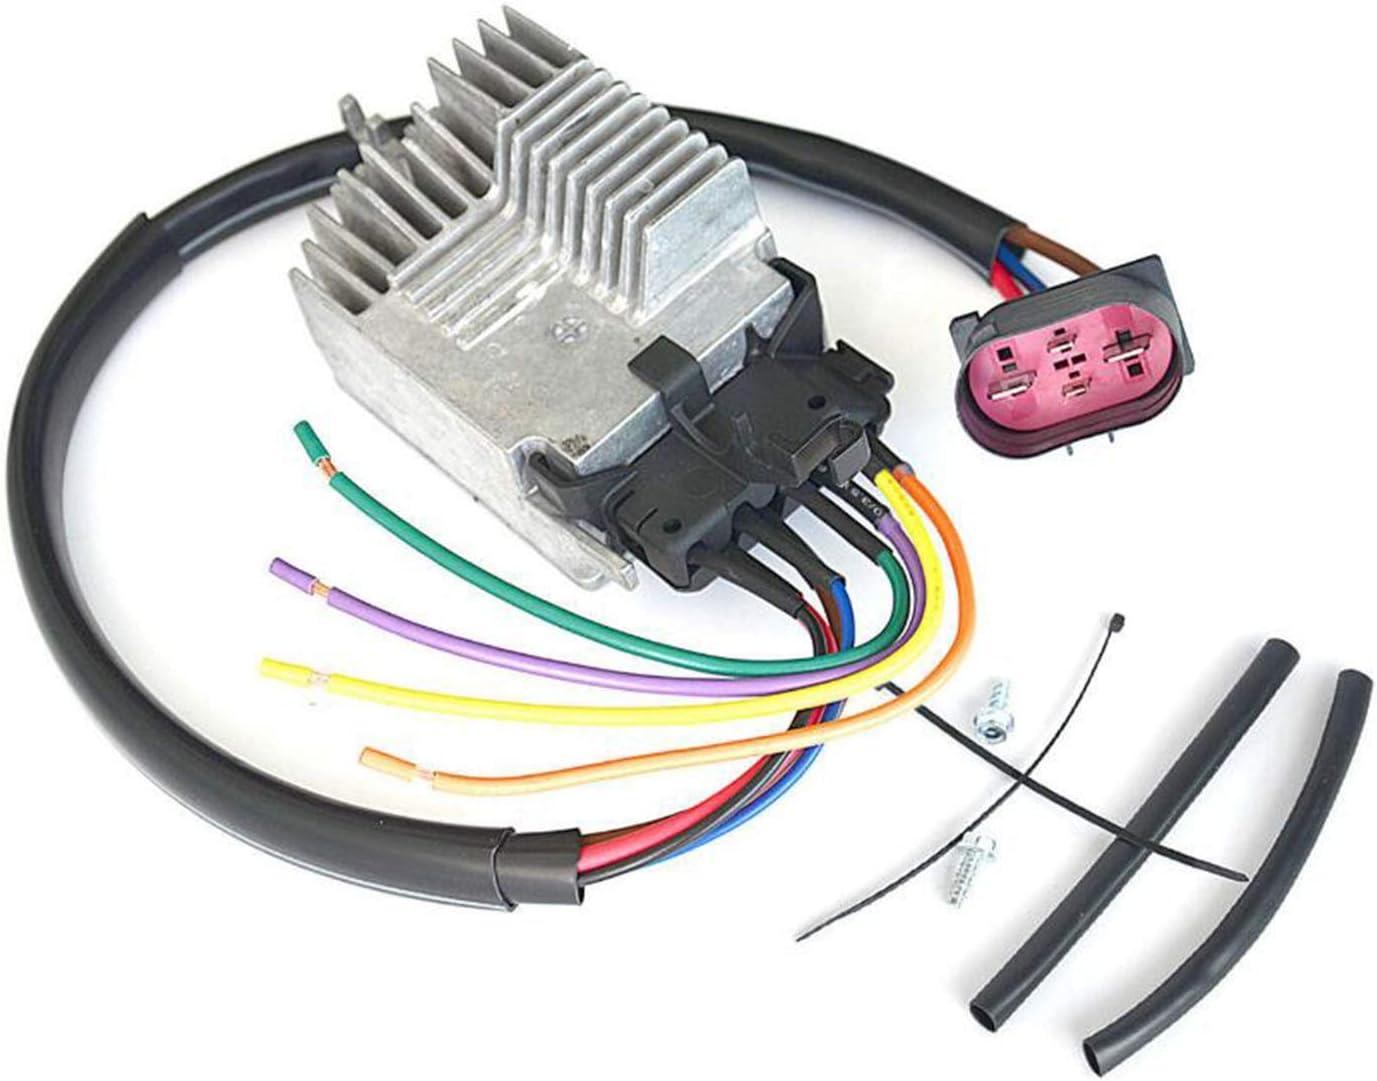 Eason Part Radiator Fan Control Module for 02-09 Audi A4 A4 Quattro Cabriolet 8E0959501AG